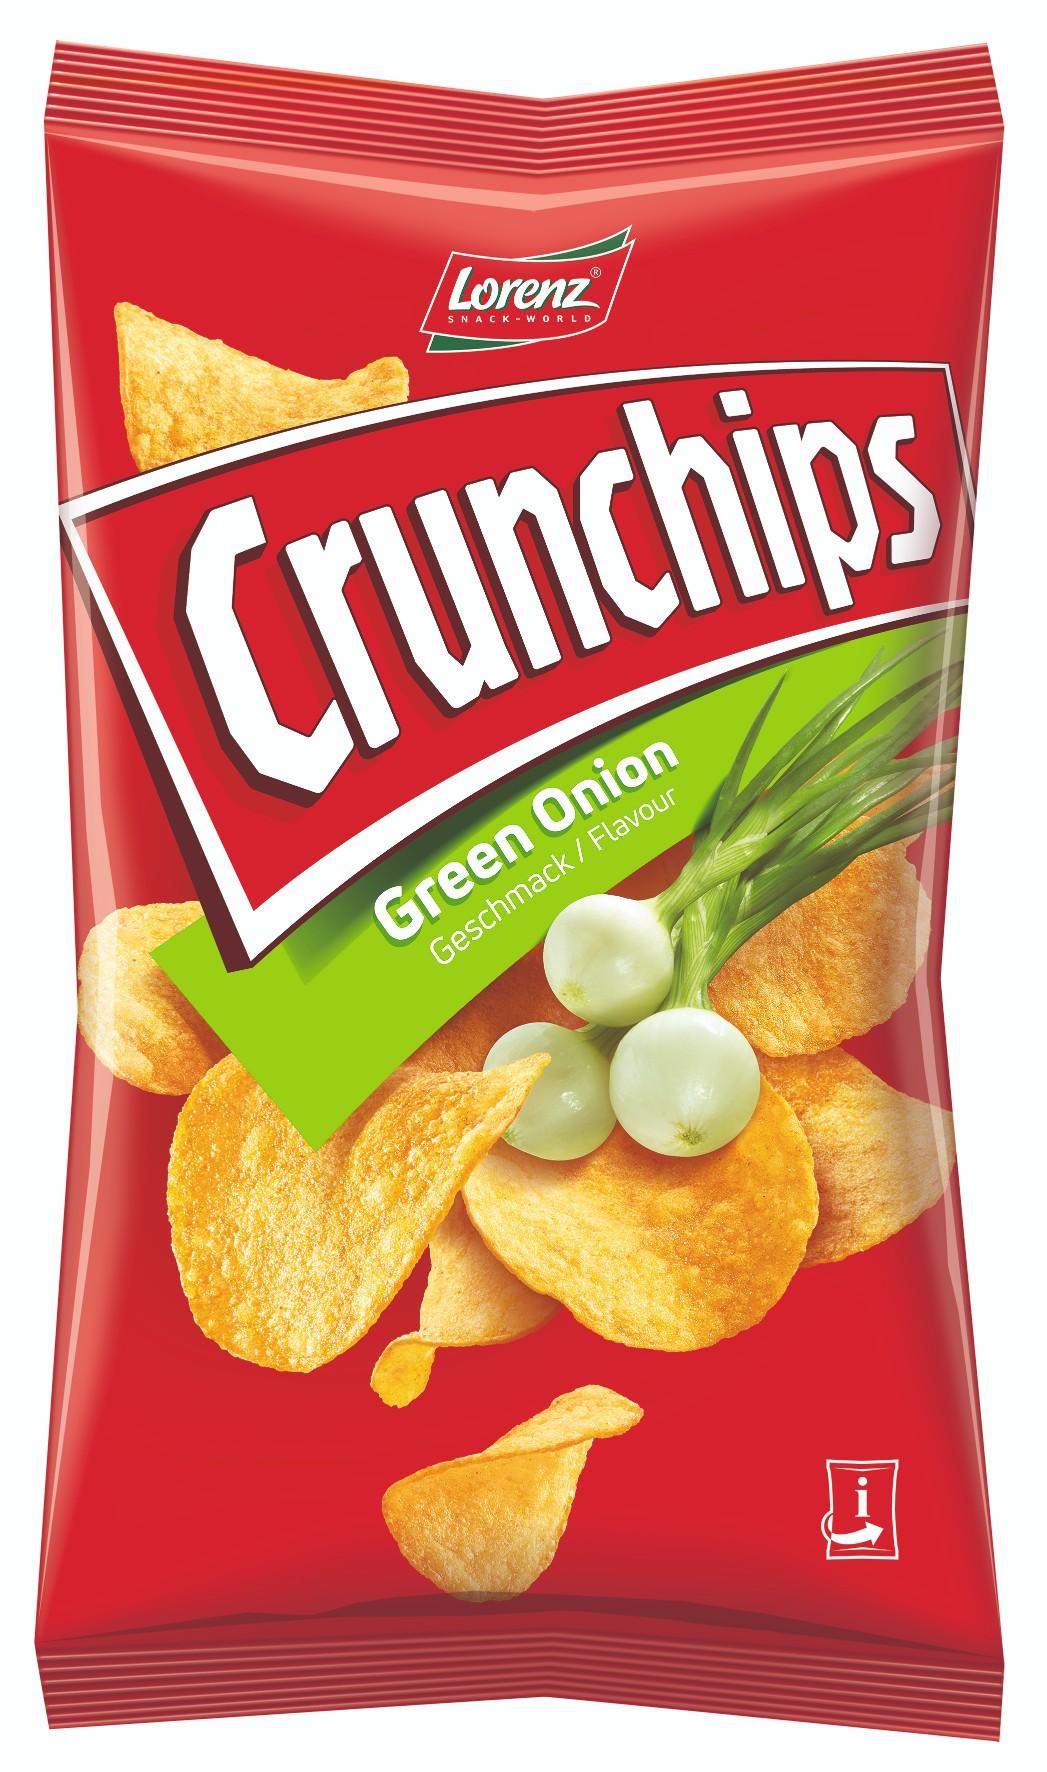 Lorenz Crunchips Green Onion 75g